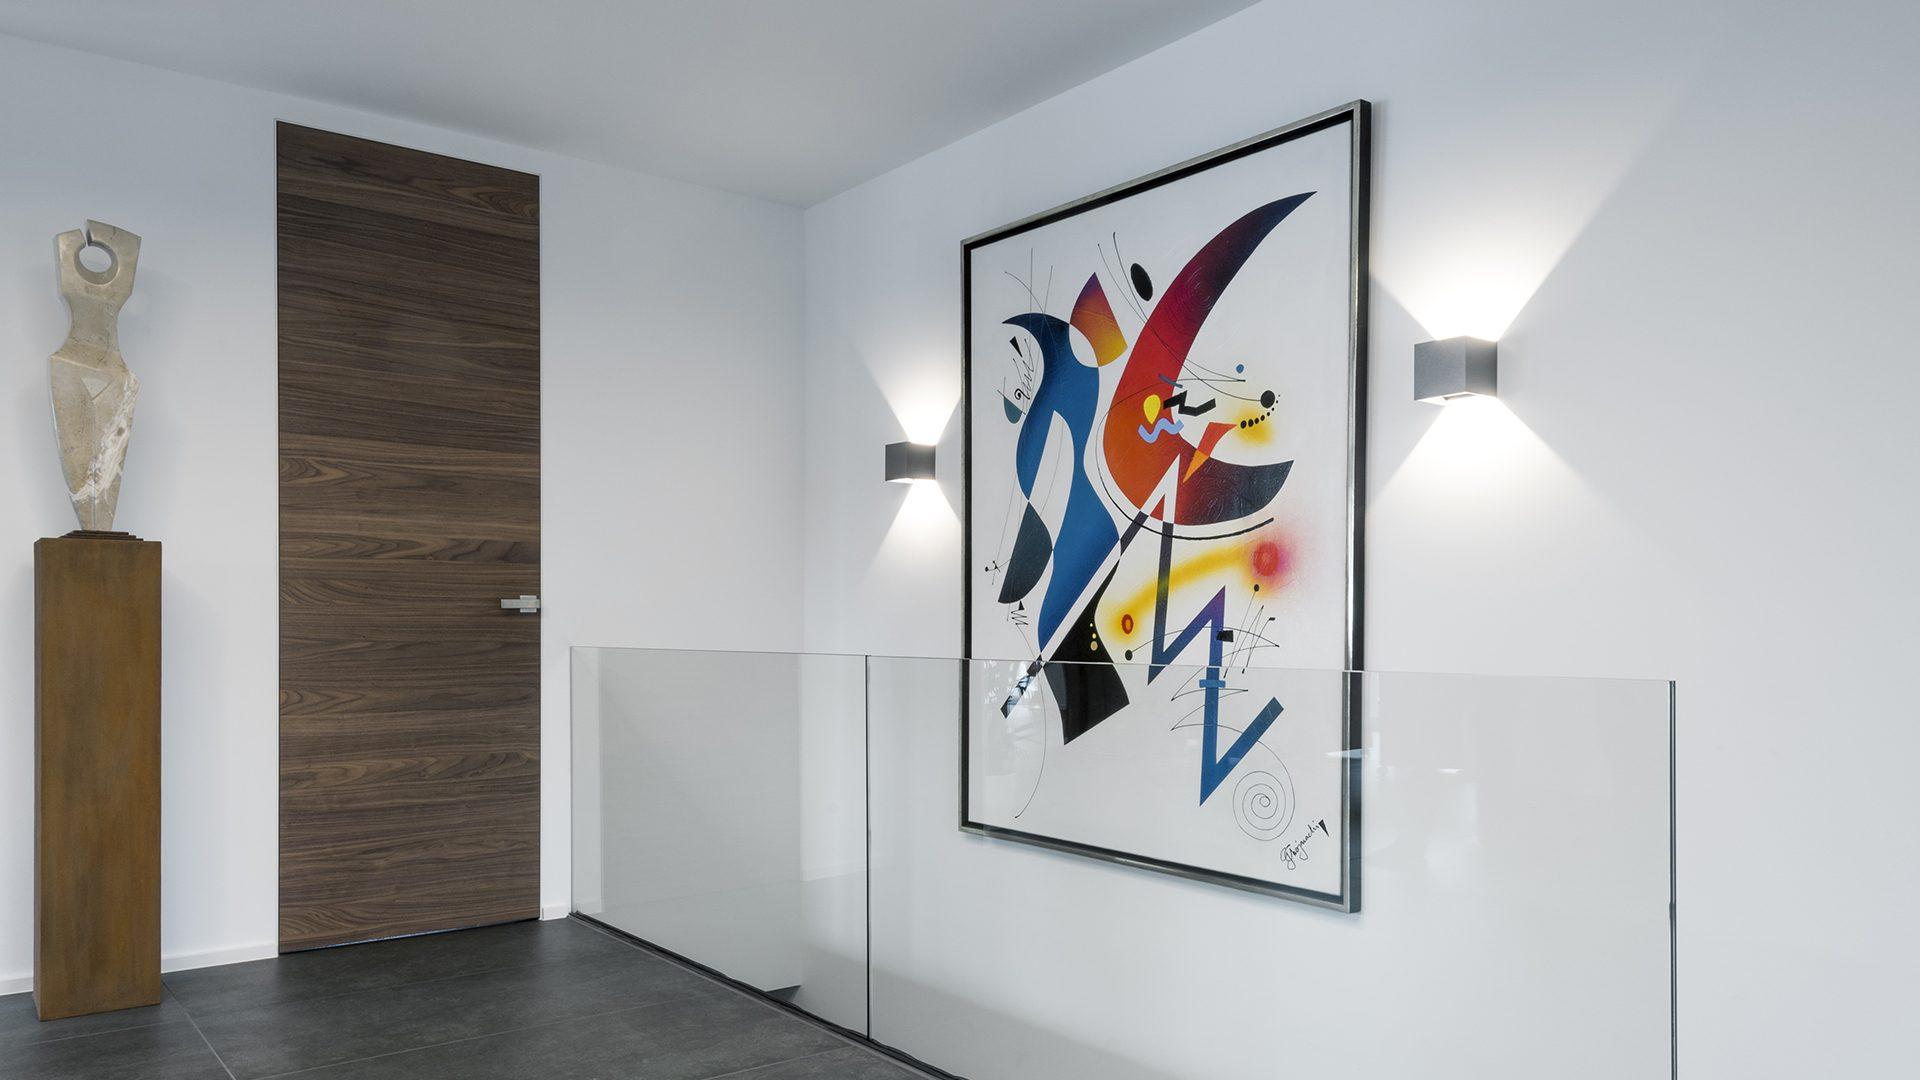 t ren br chert k rner konold vitadoor modulwerk huga wilhelm bl m holzhandlung gmbh. Black Bedroom Furniture Sets. Home Design Ideas